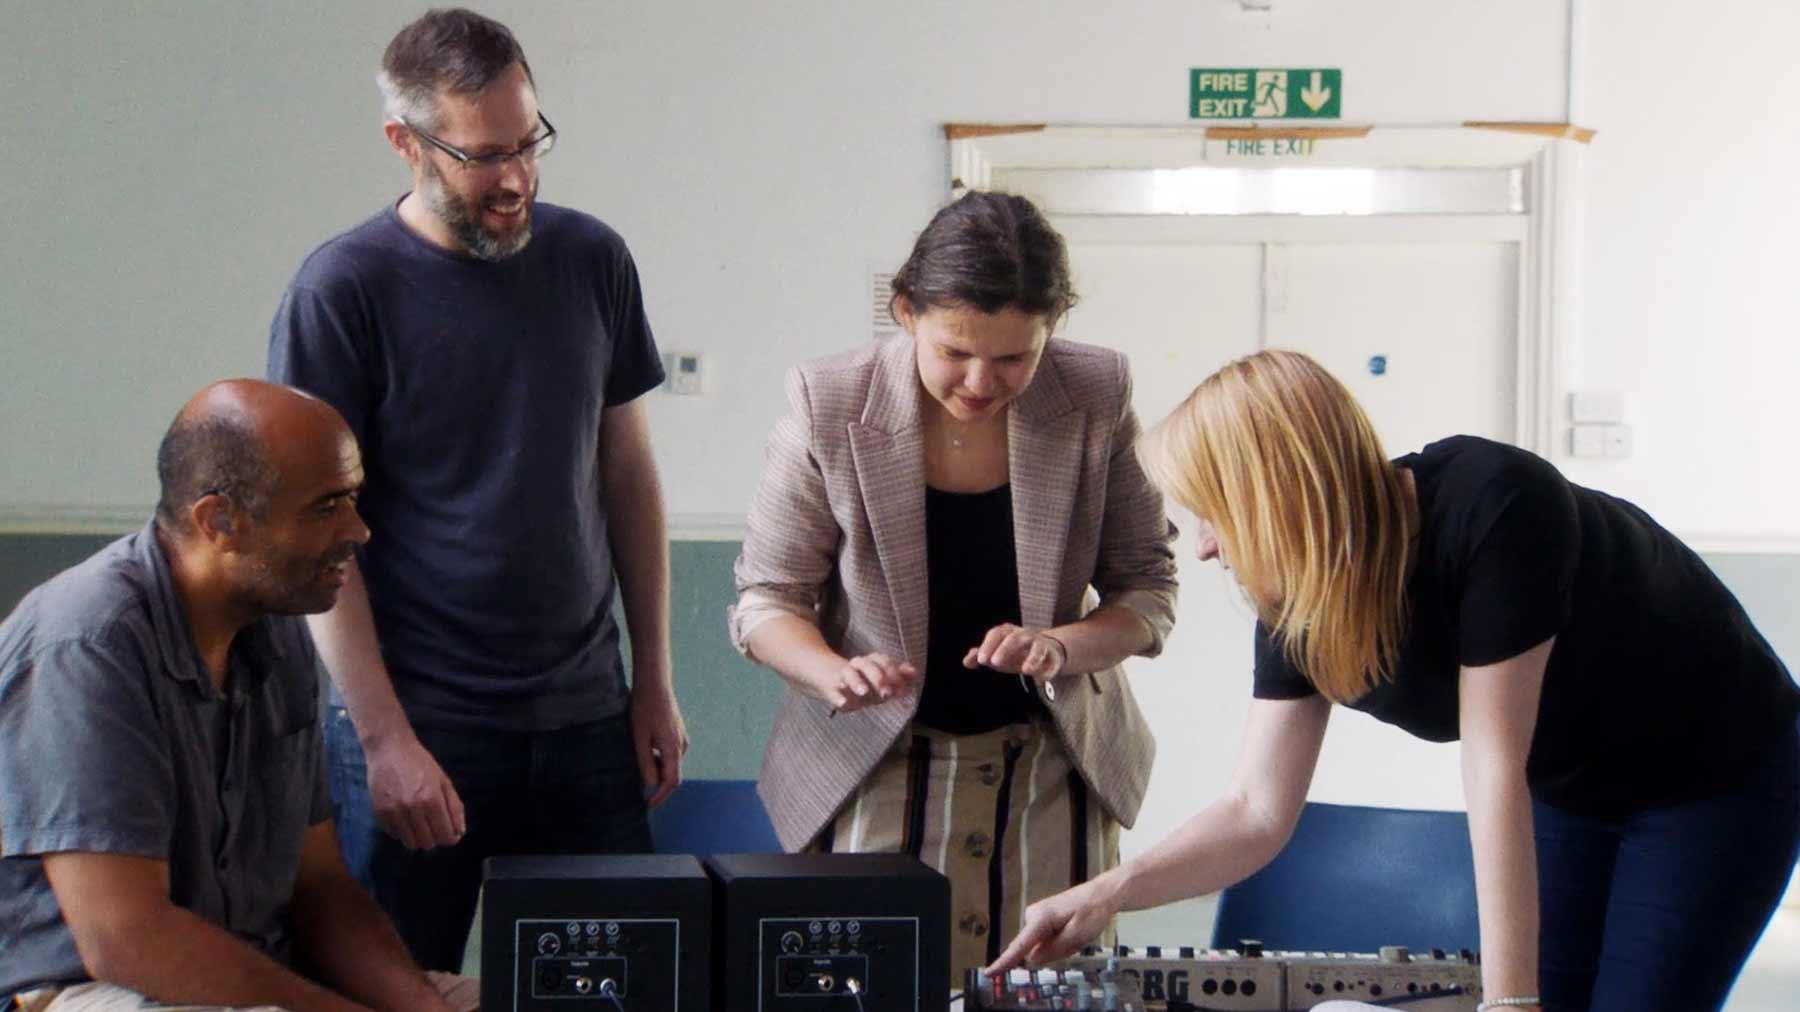 Wie taube Leute elektronische Musik wahrnehmen a-sonic-pulse-dokumentation